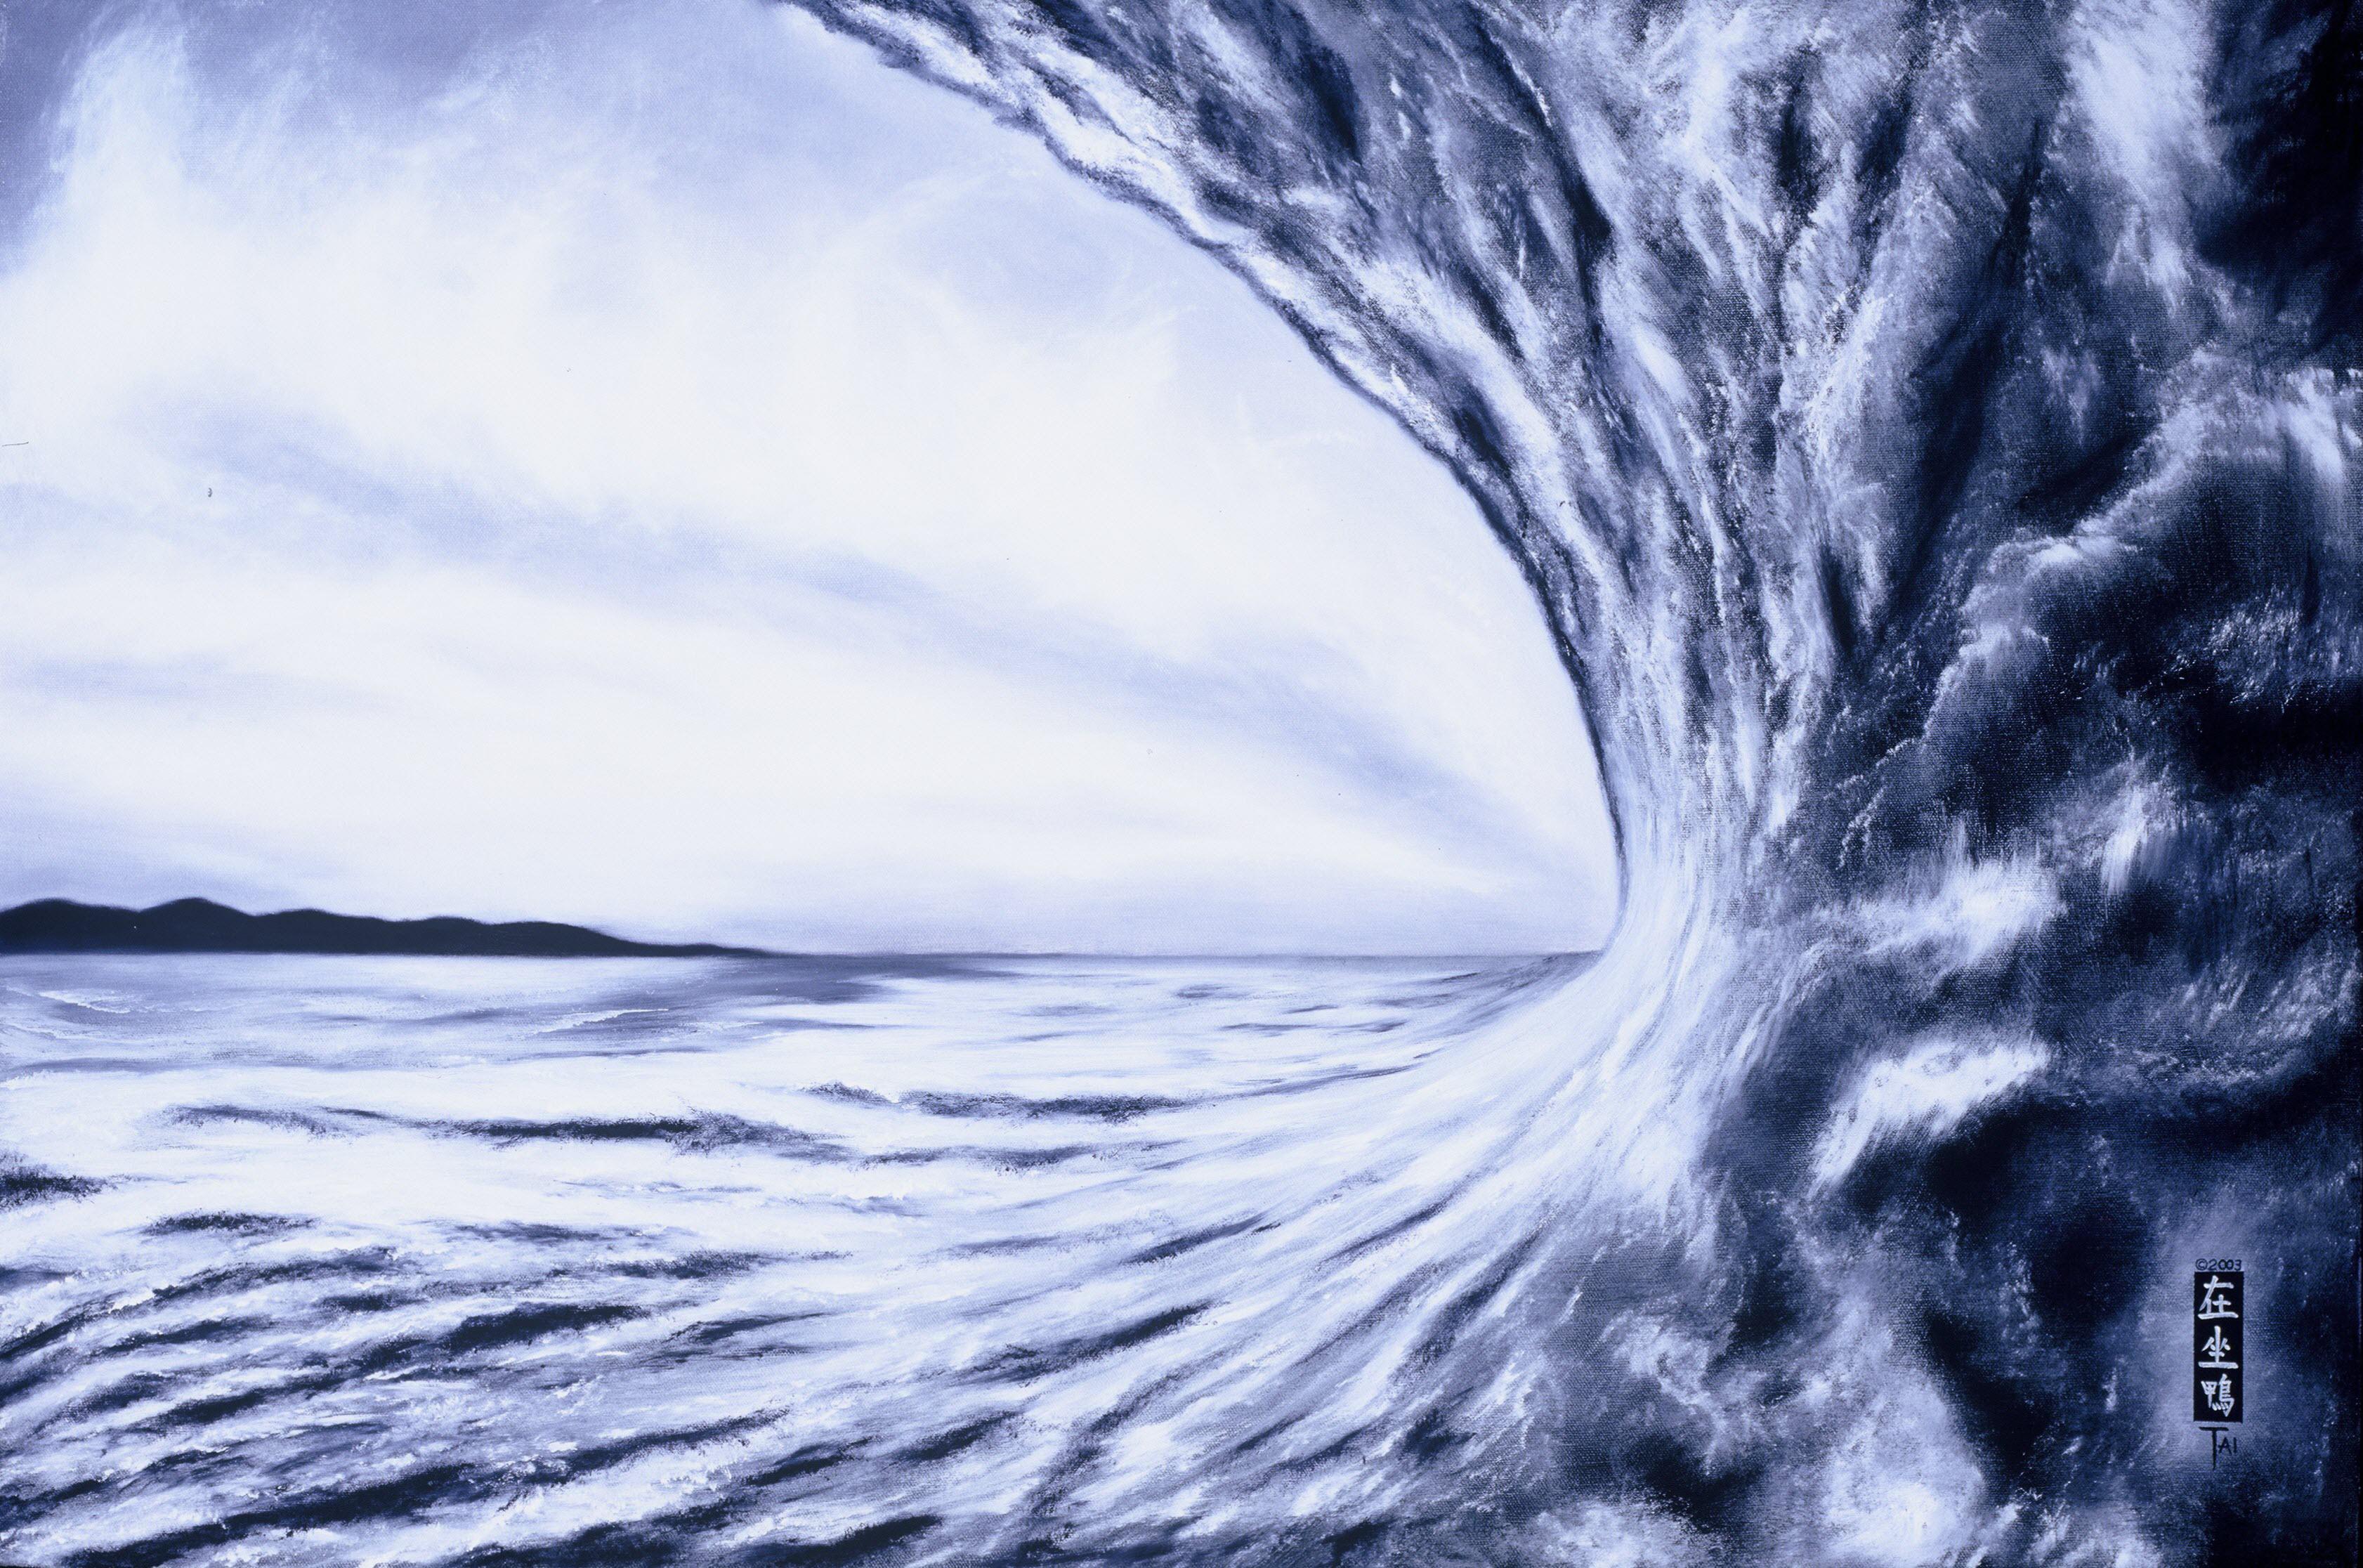 Artist Hangout 30 - South African Wave II (2003 Nov) (oil) - By Artist Tai Zen